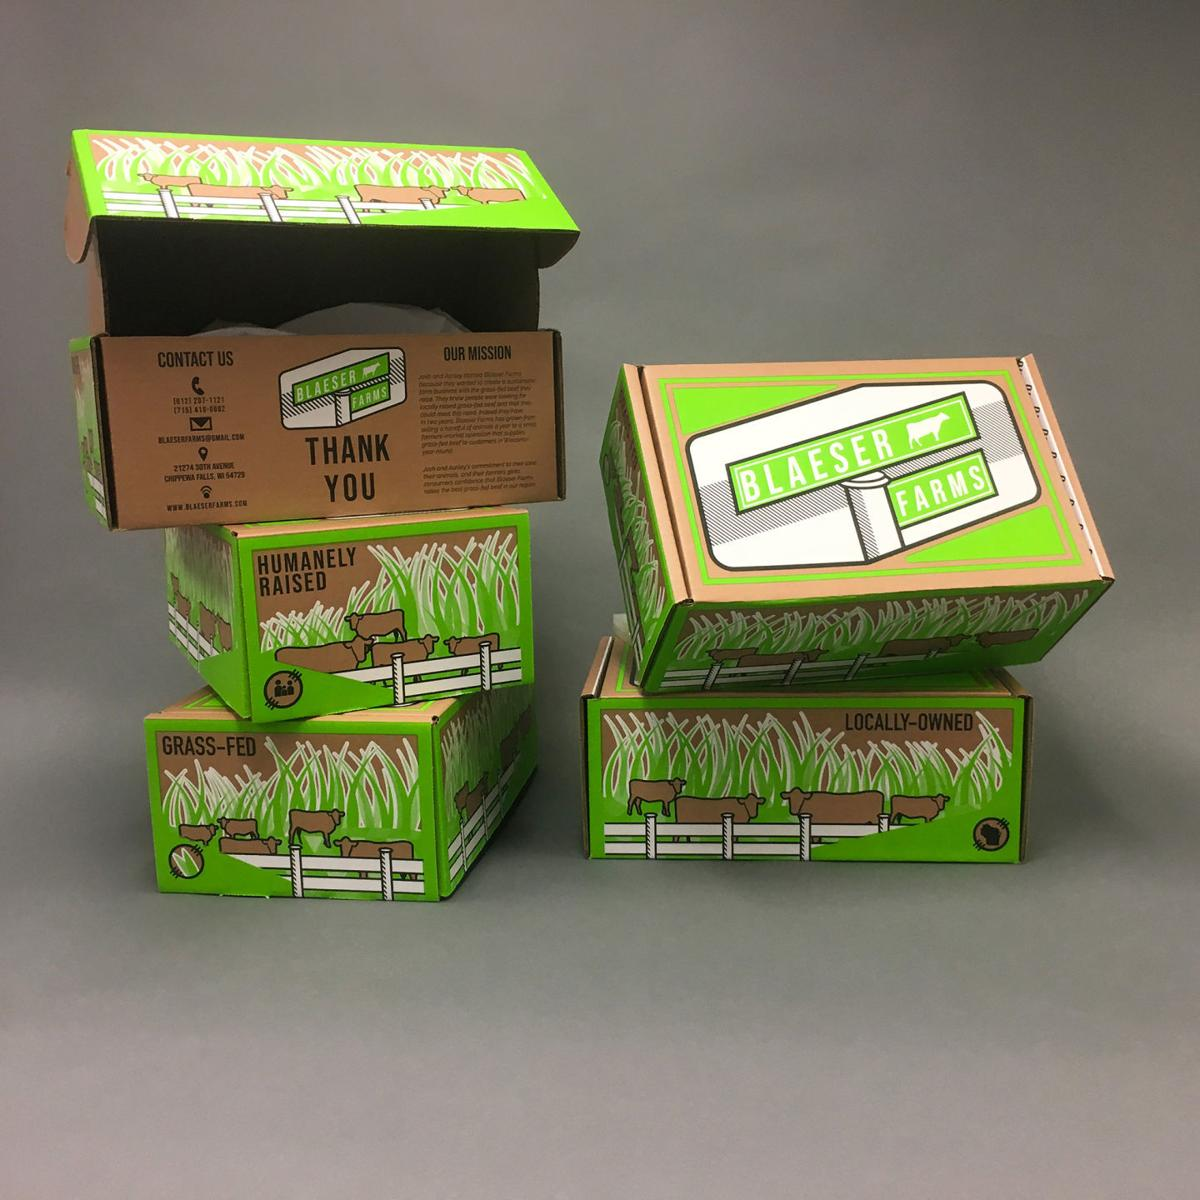 Blaeser Farms box